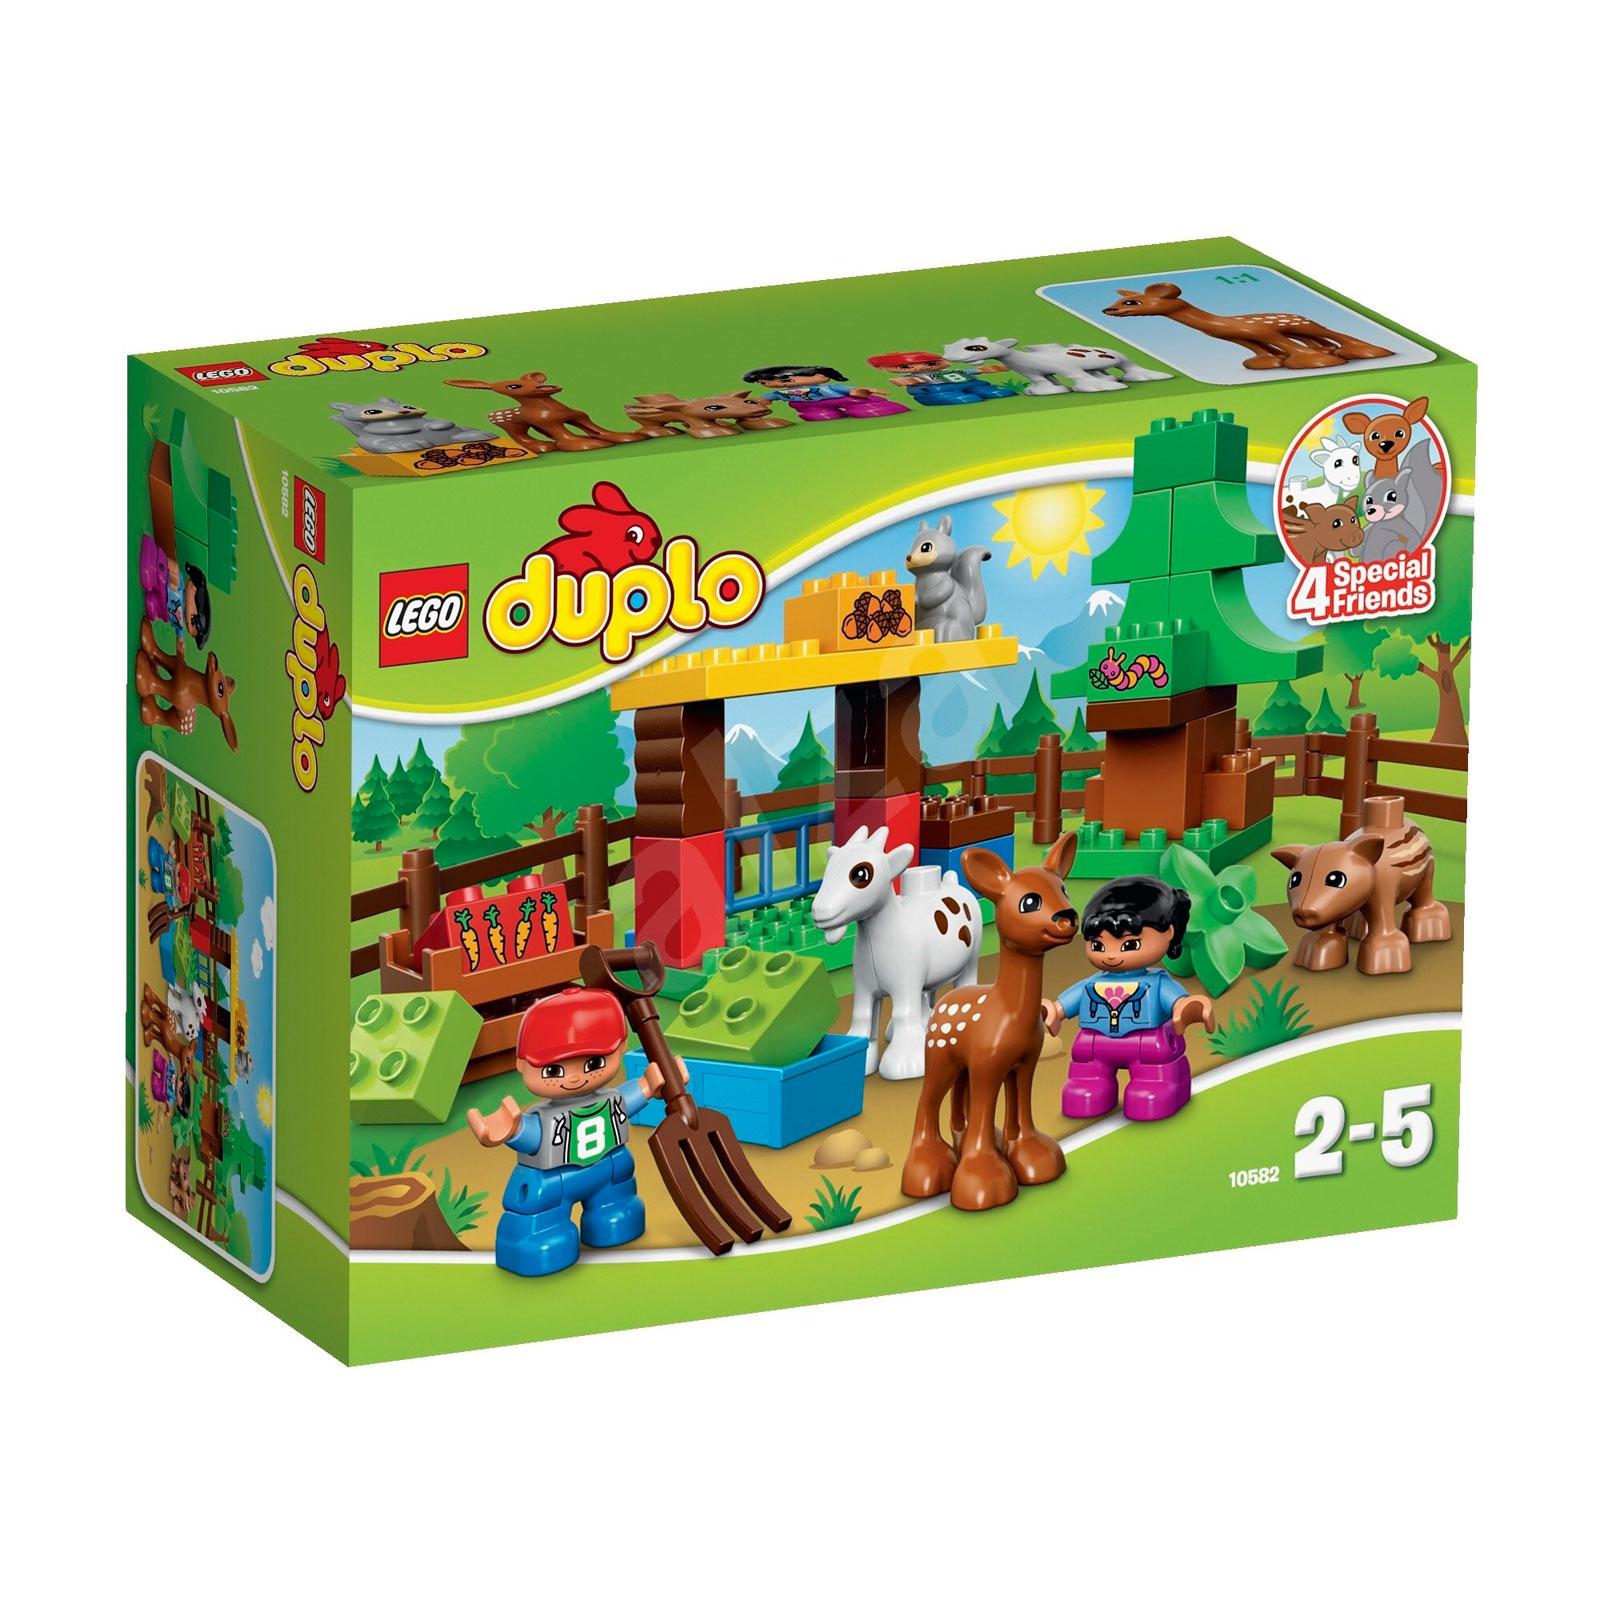 ����������� LEGO Duplo 10582 ������ ��������